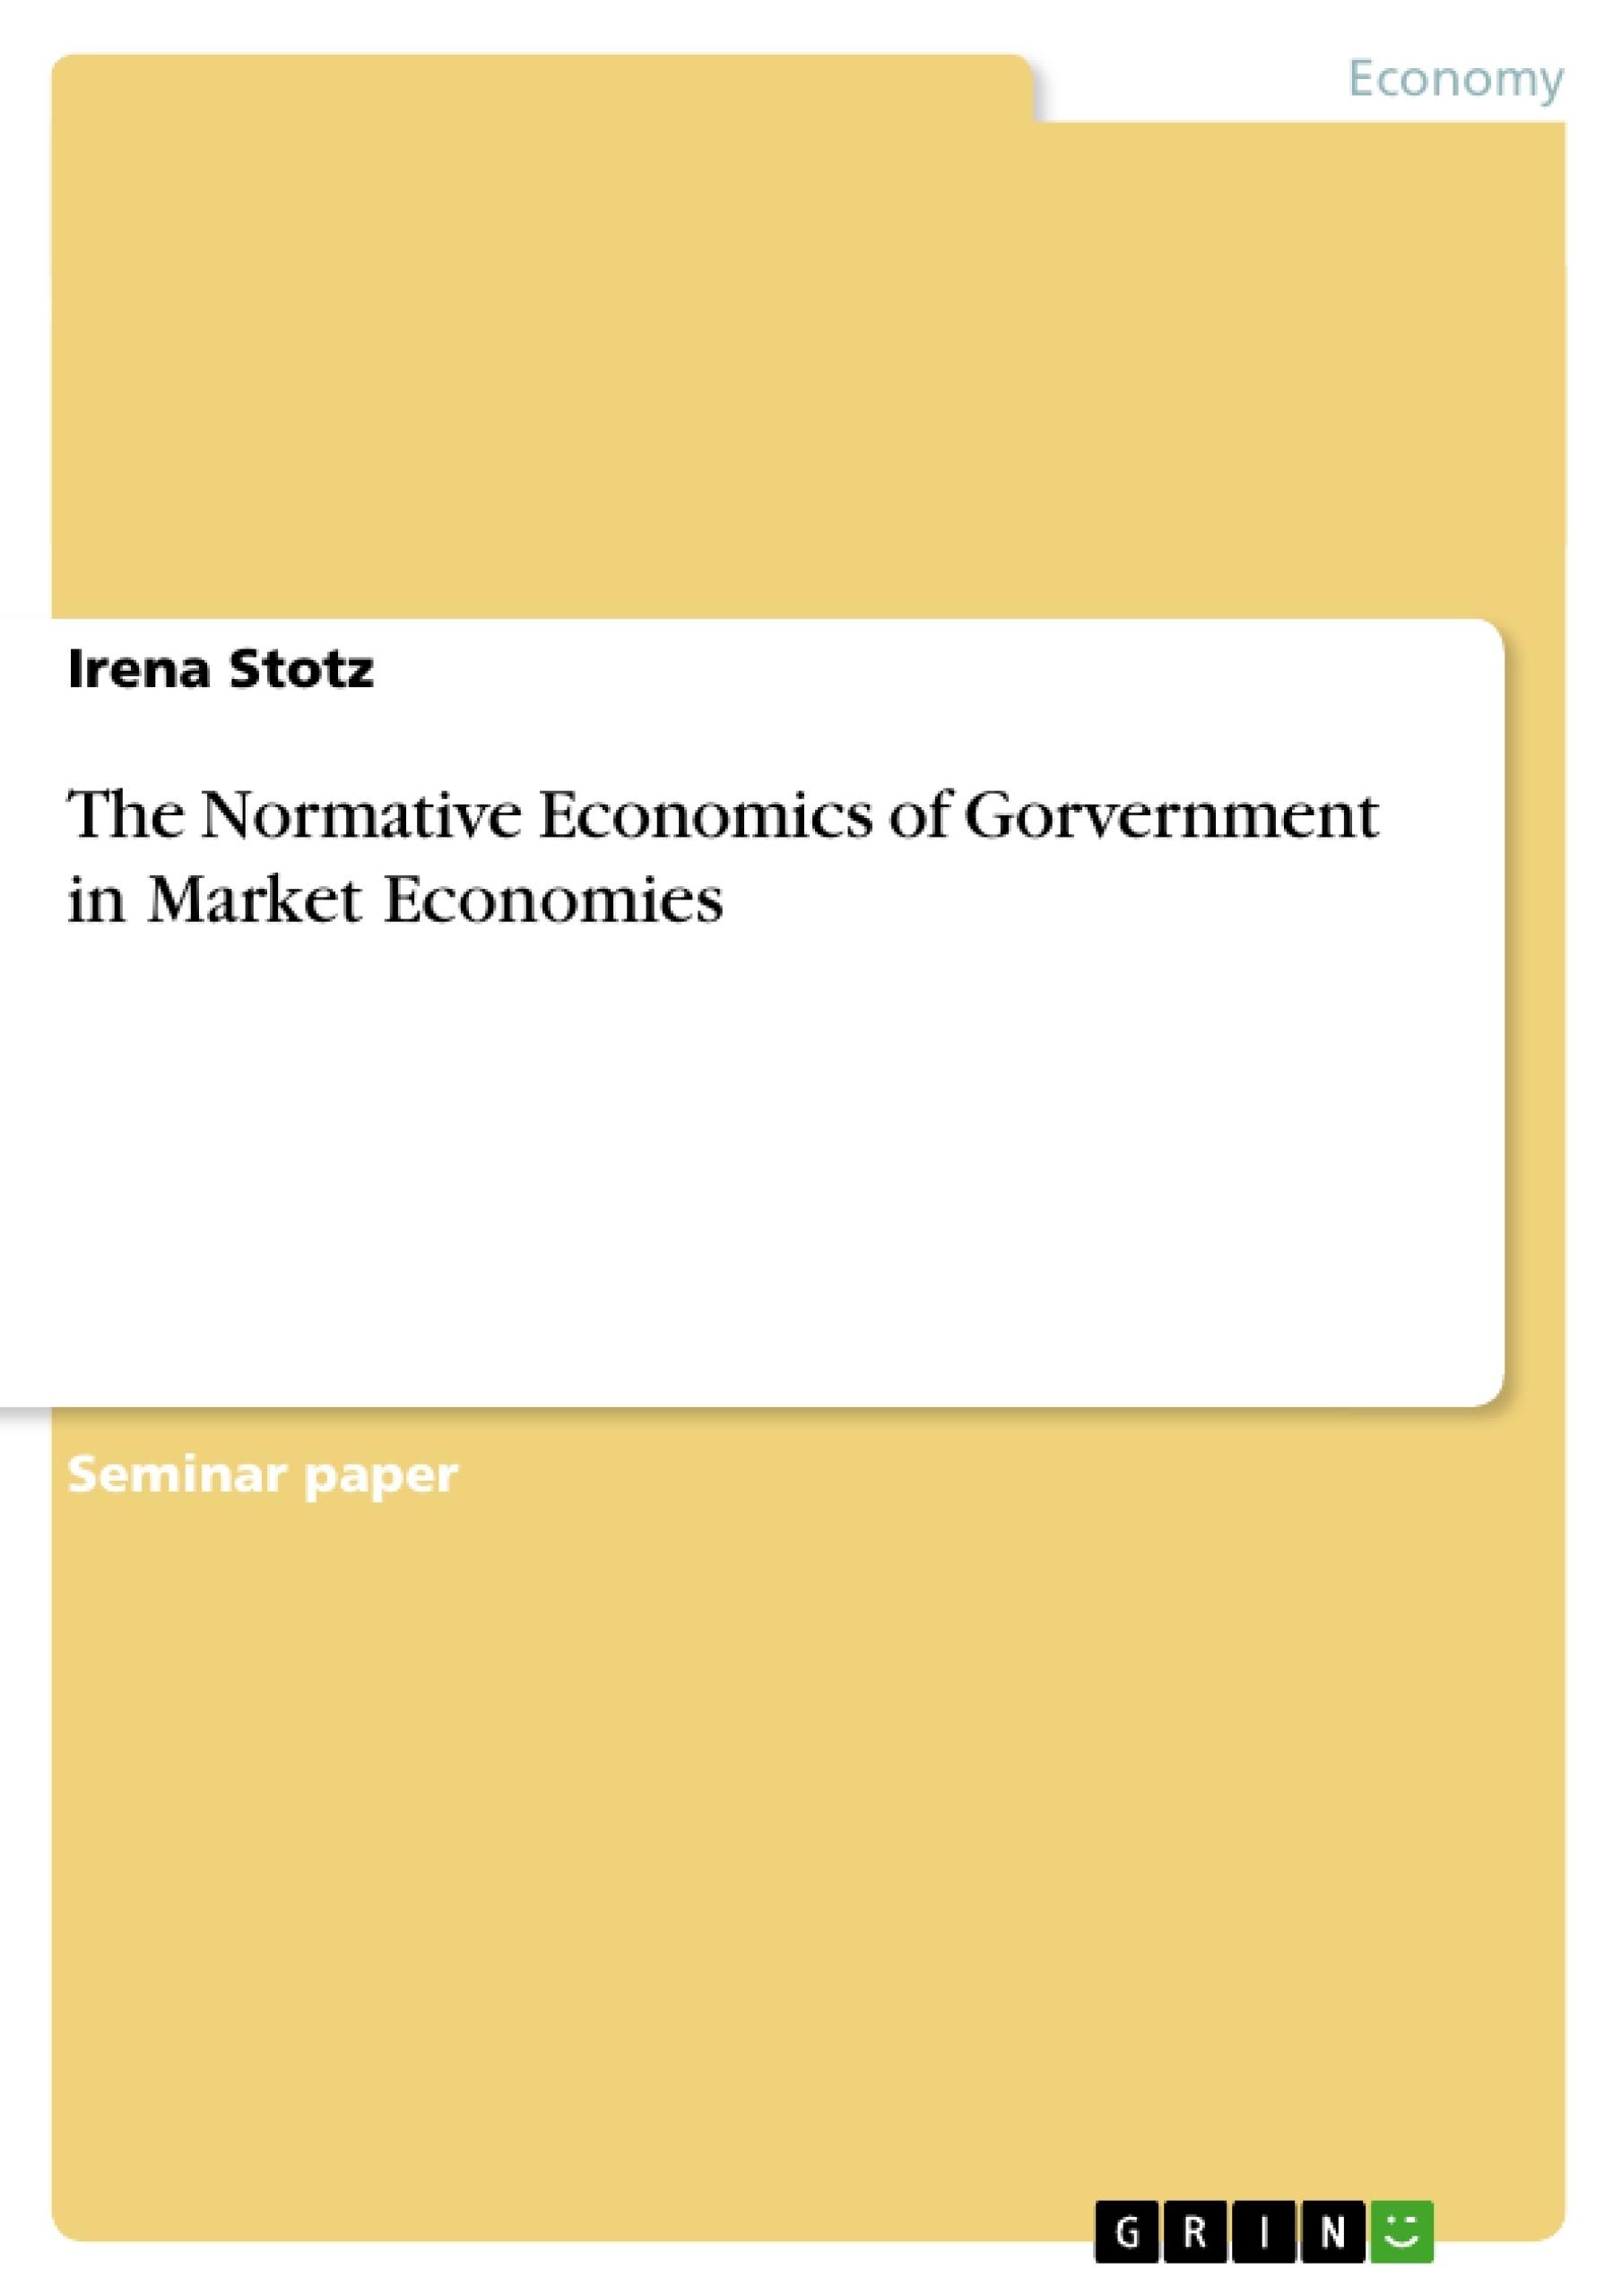 Title: The Normative Economics of Gorvernment in Market Economies